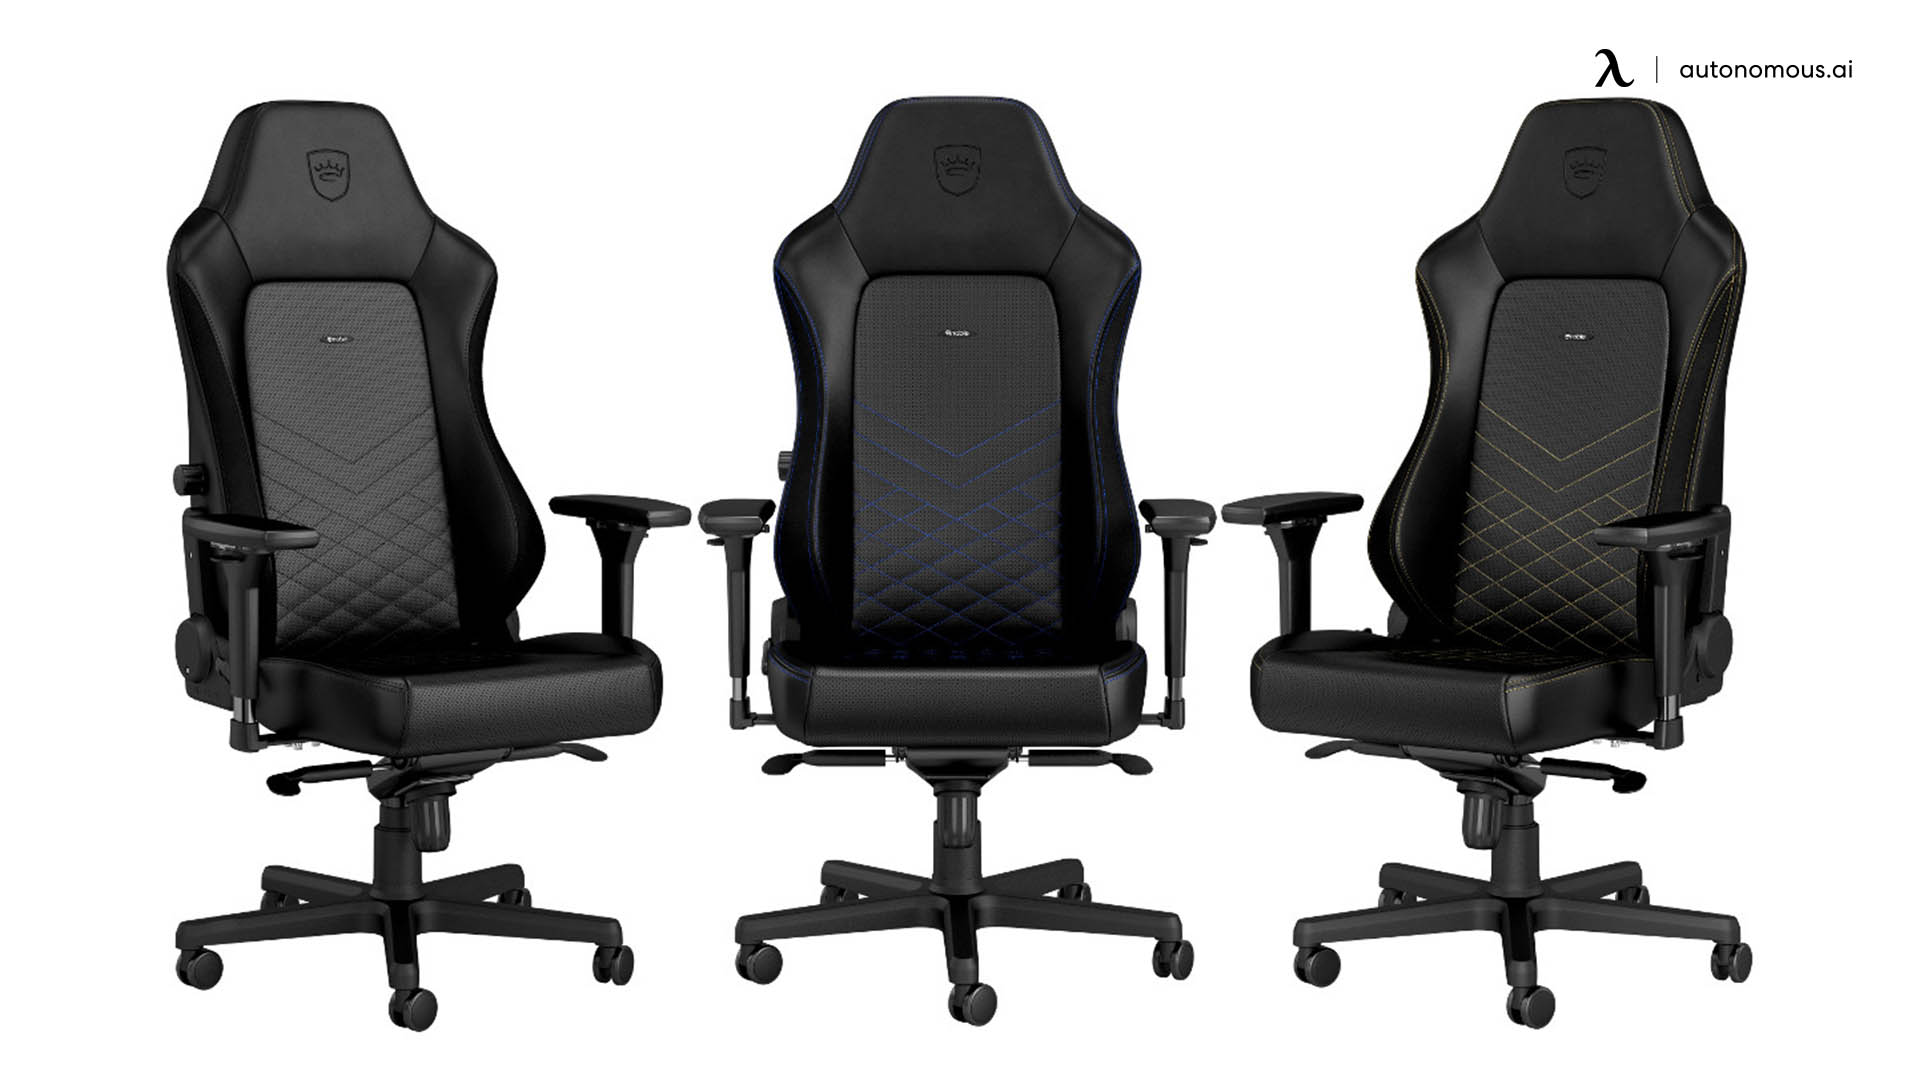 Noblechair HERO Ergonomic Chair